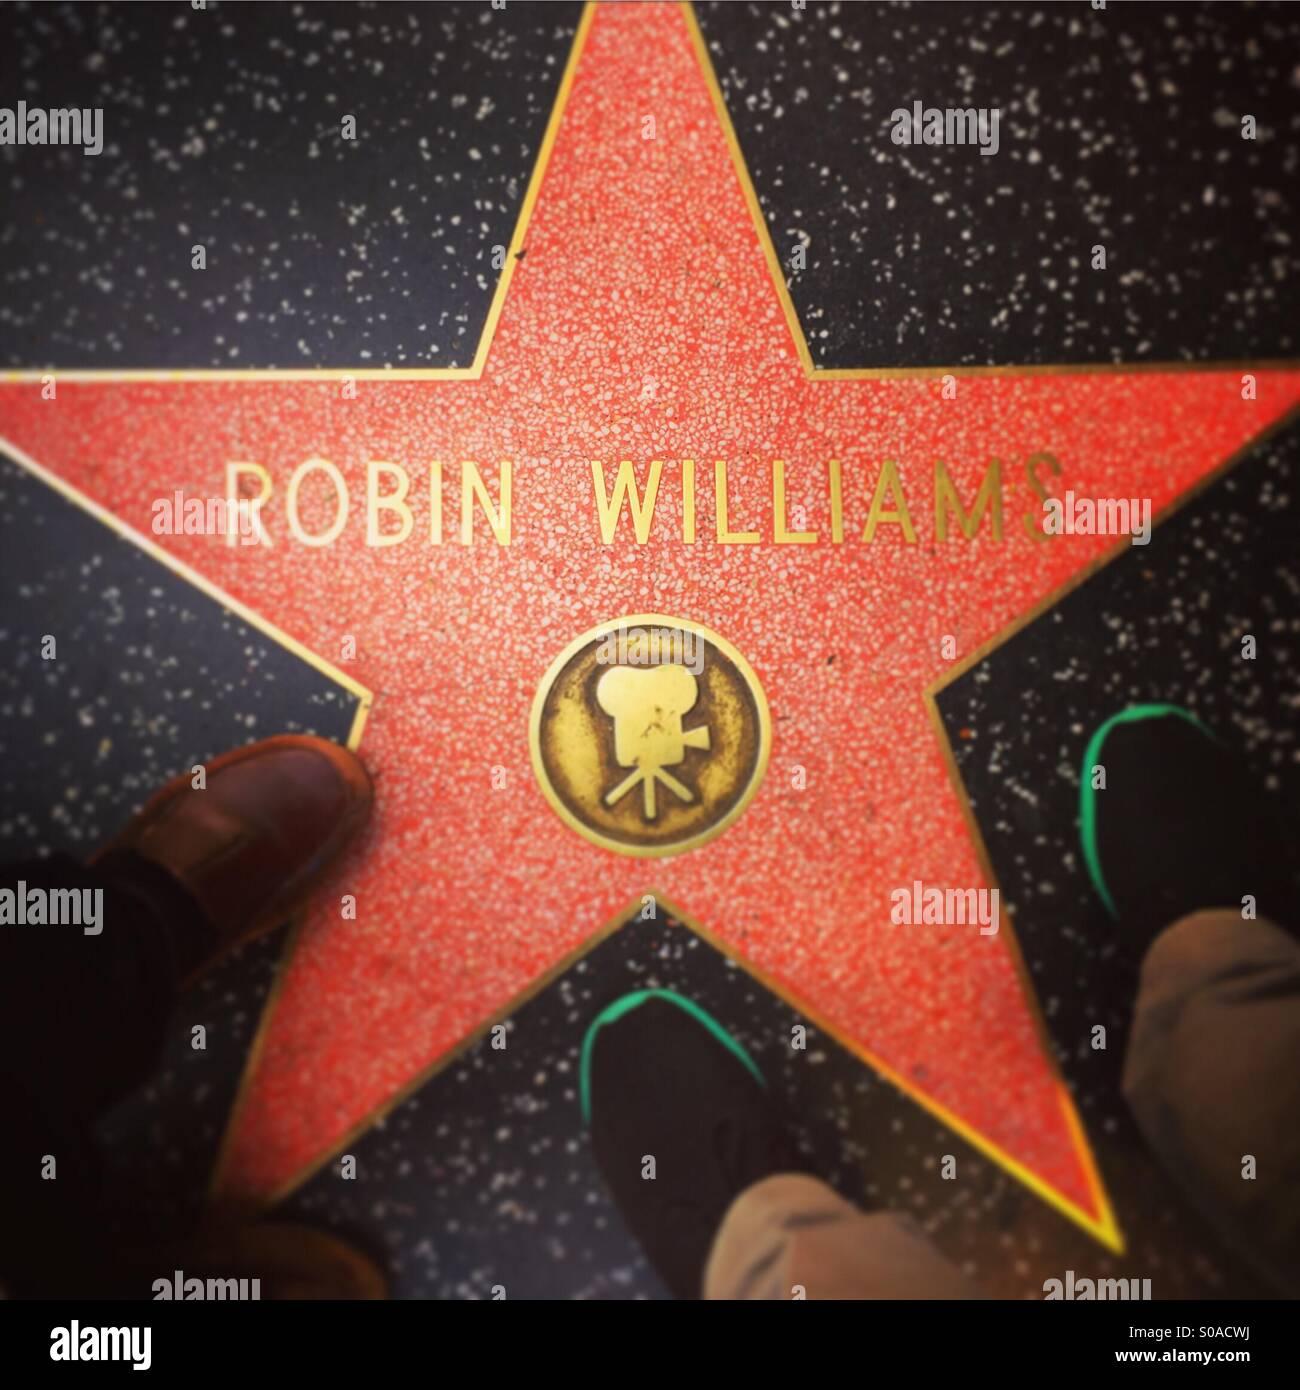 Good night sweet prince. Robin Williams RIP. - Stock Image